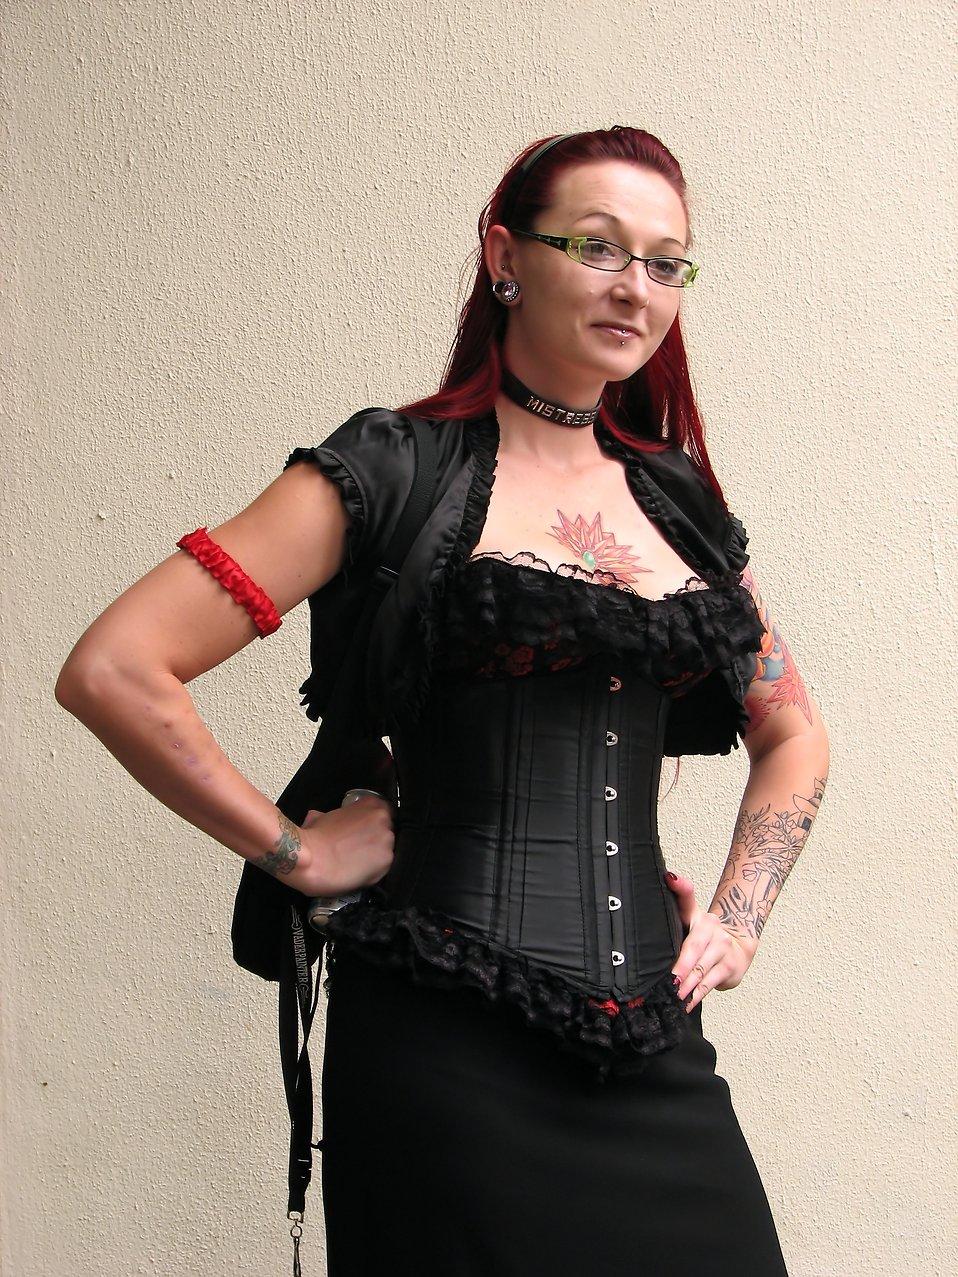 A woman in a costume at Dragoncon 2009 in Atlanta, Georgia : Free Stock Photo